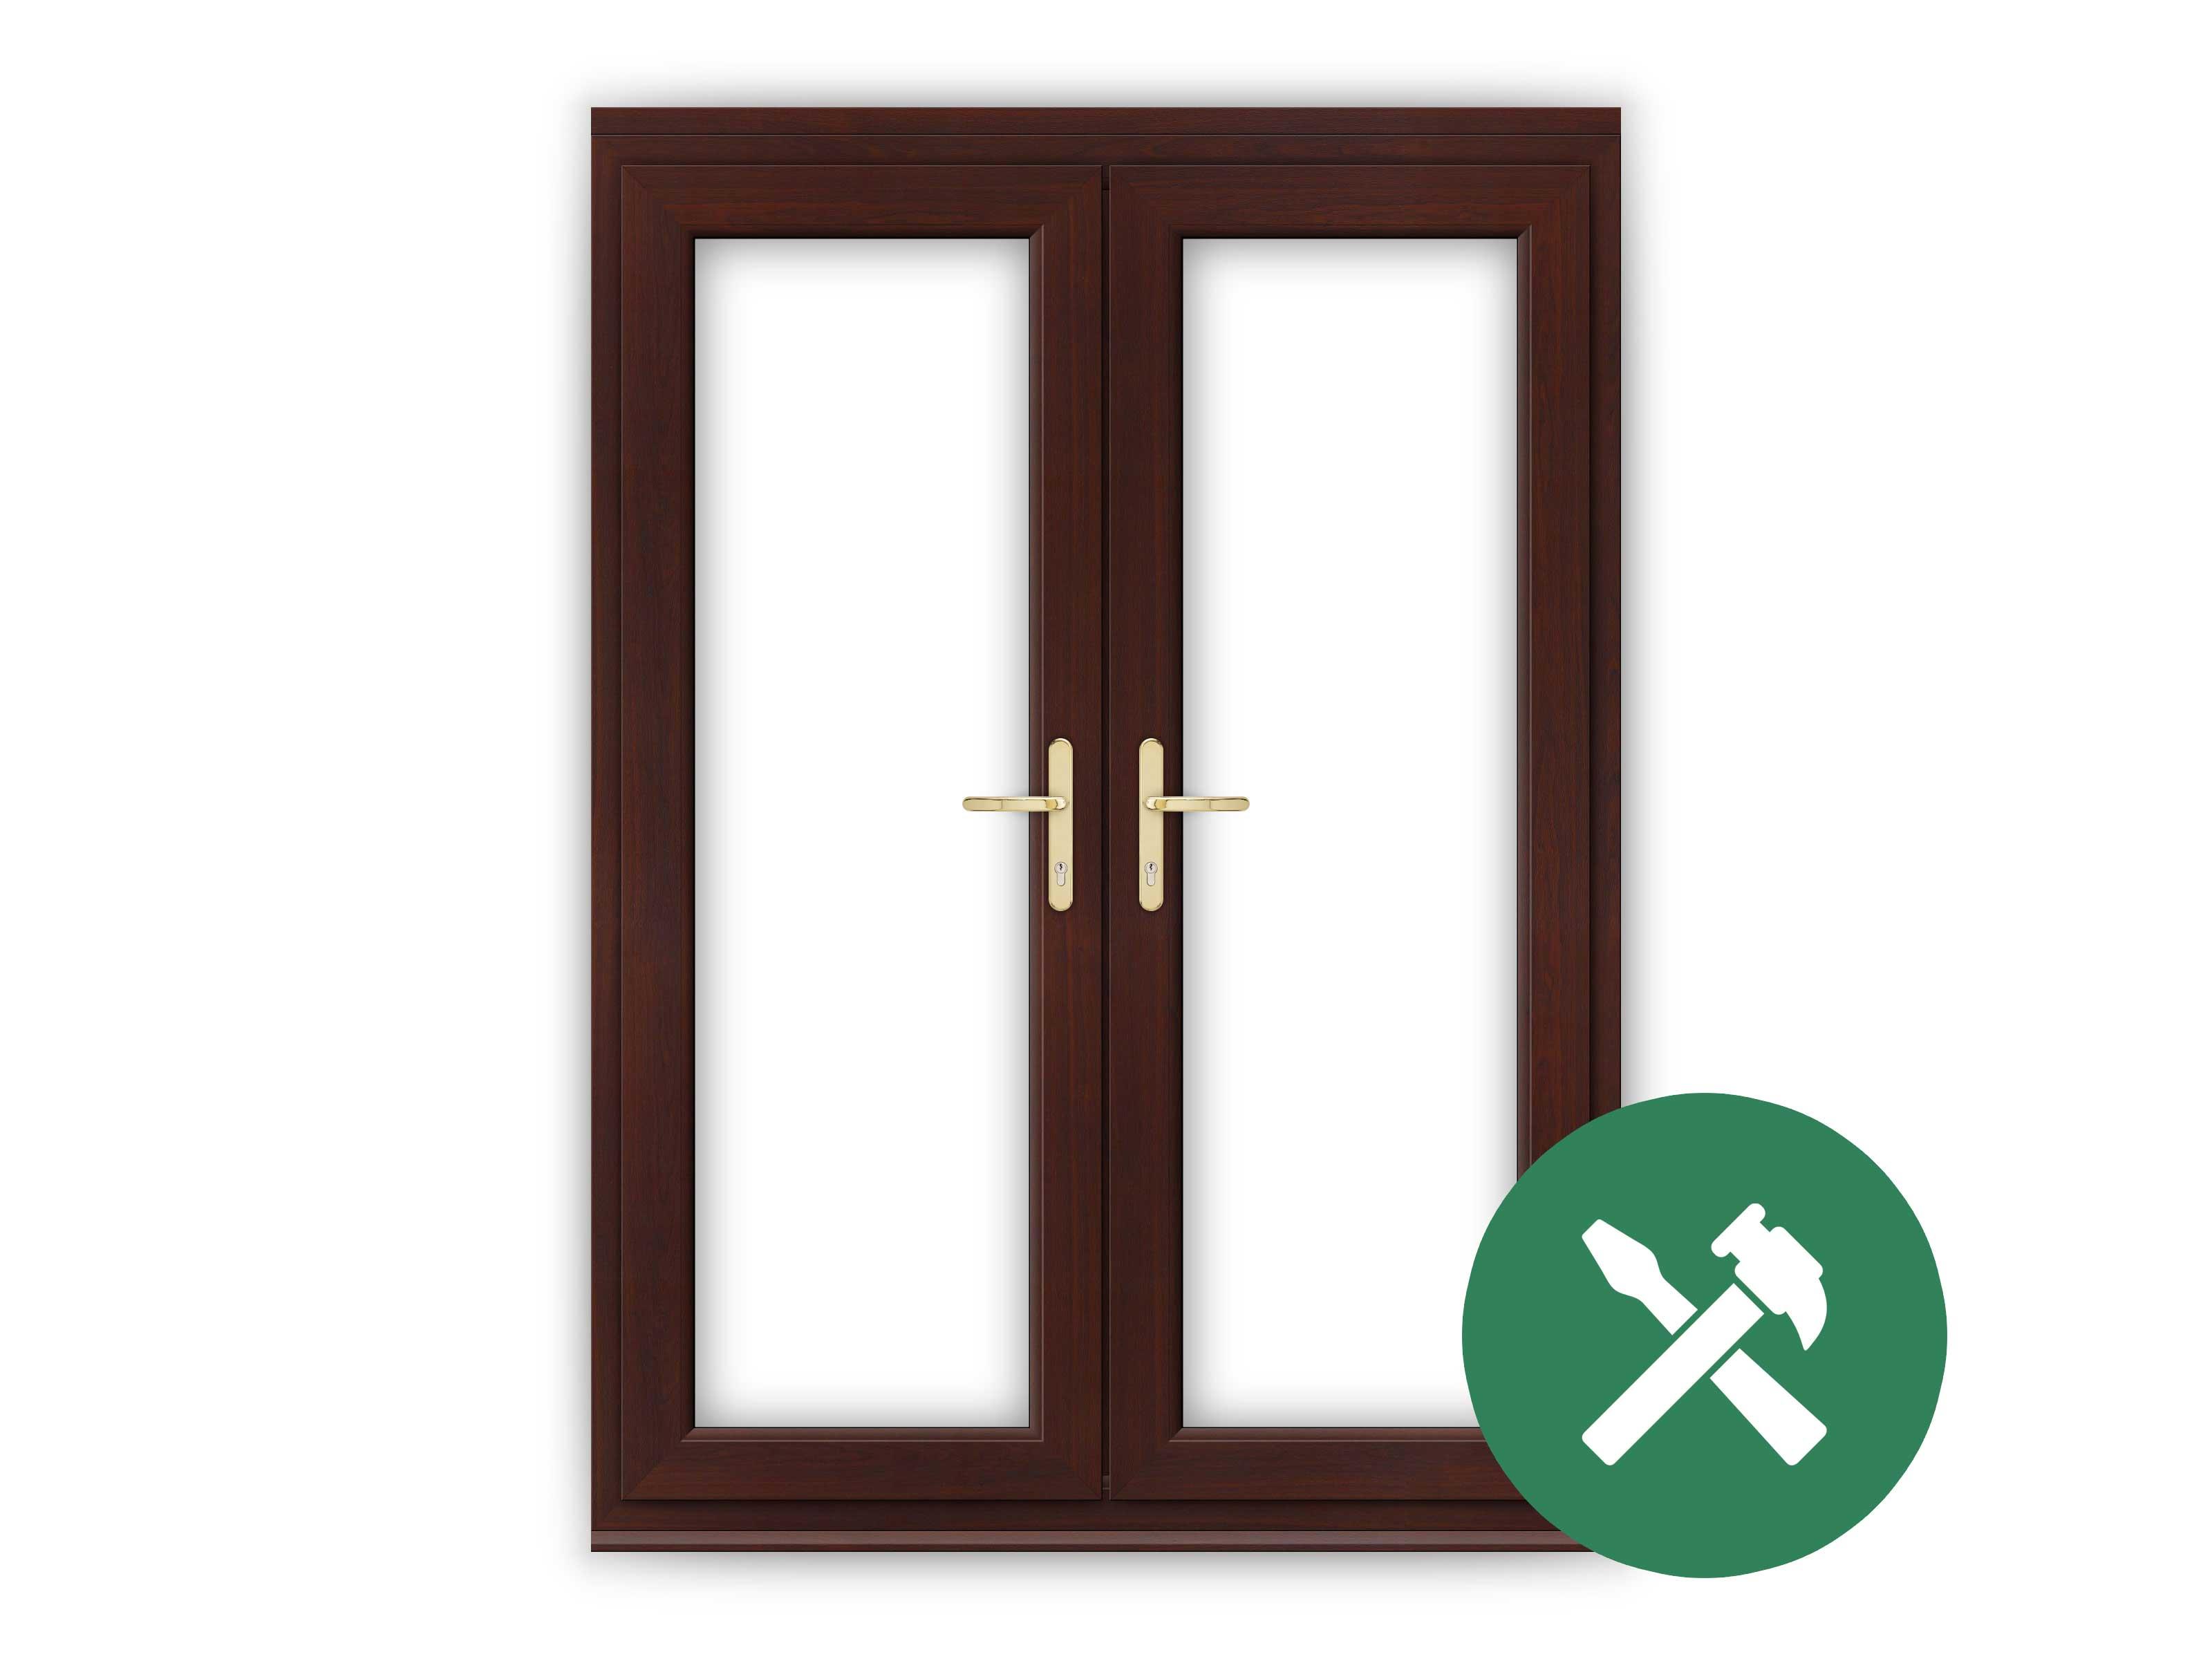 Custom rosewood upvc french door set flying doors for Made to measure upvc french doors